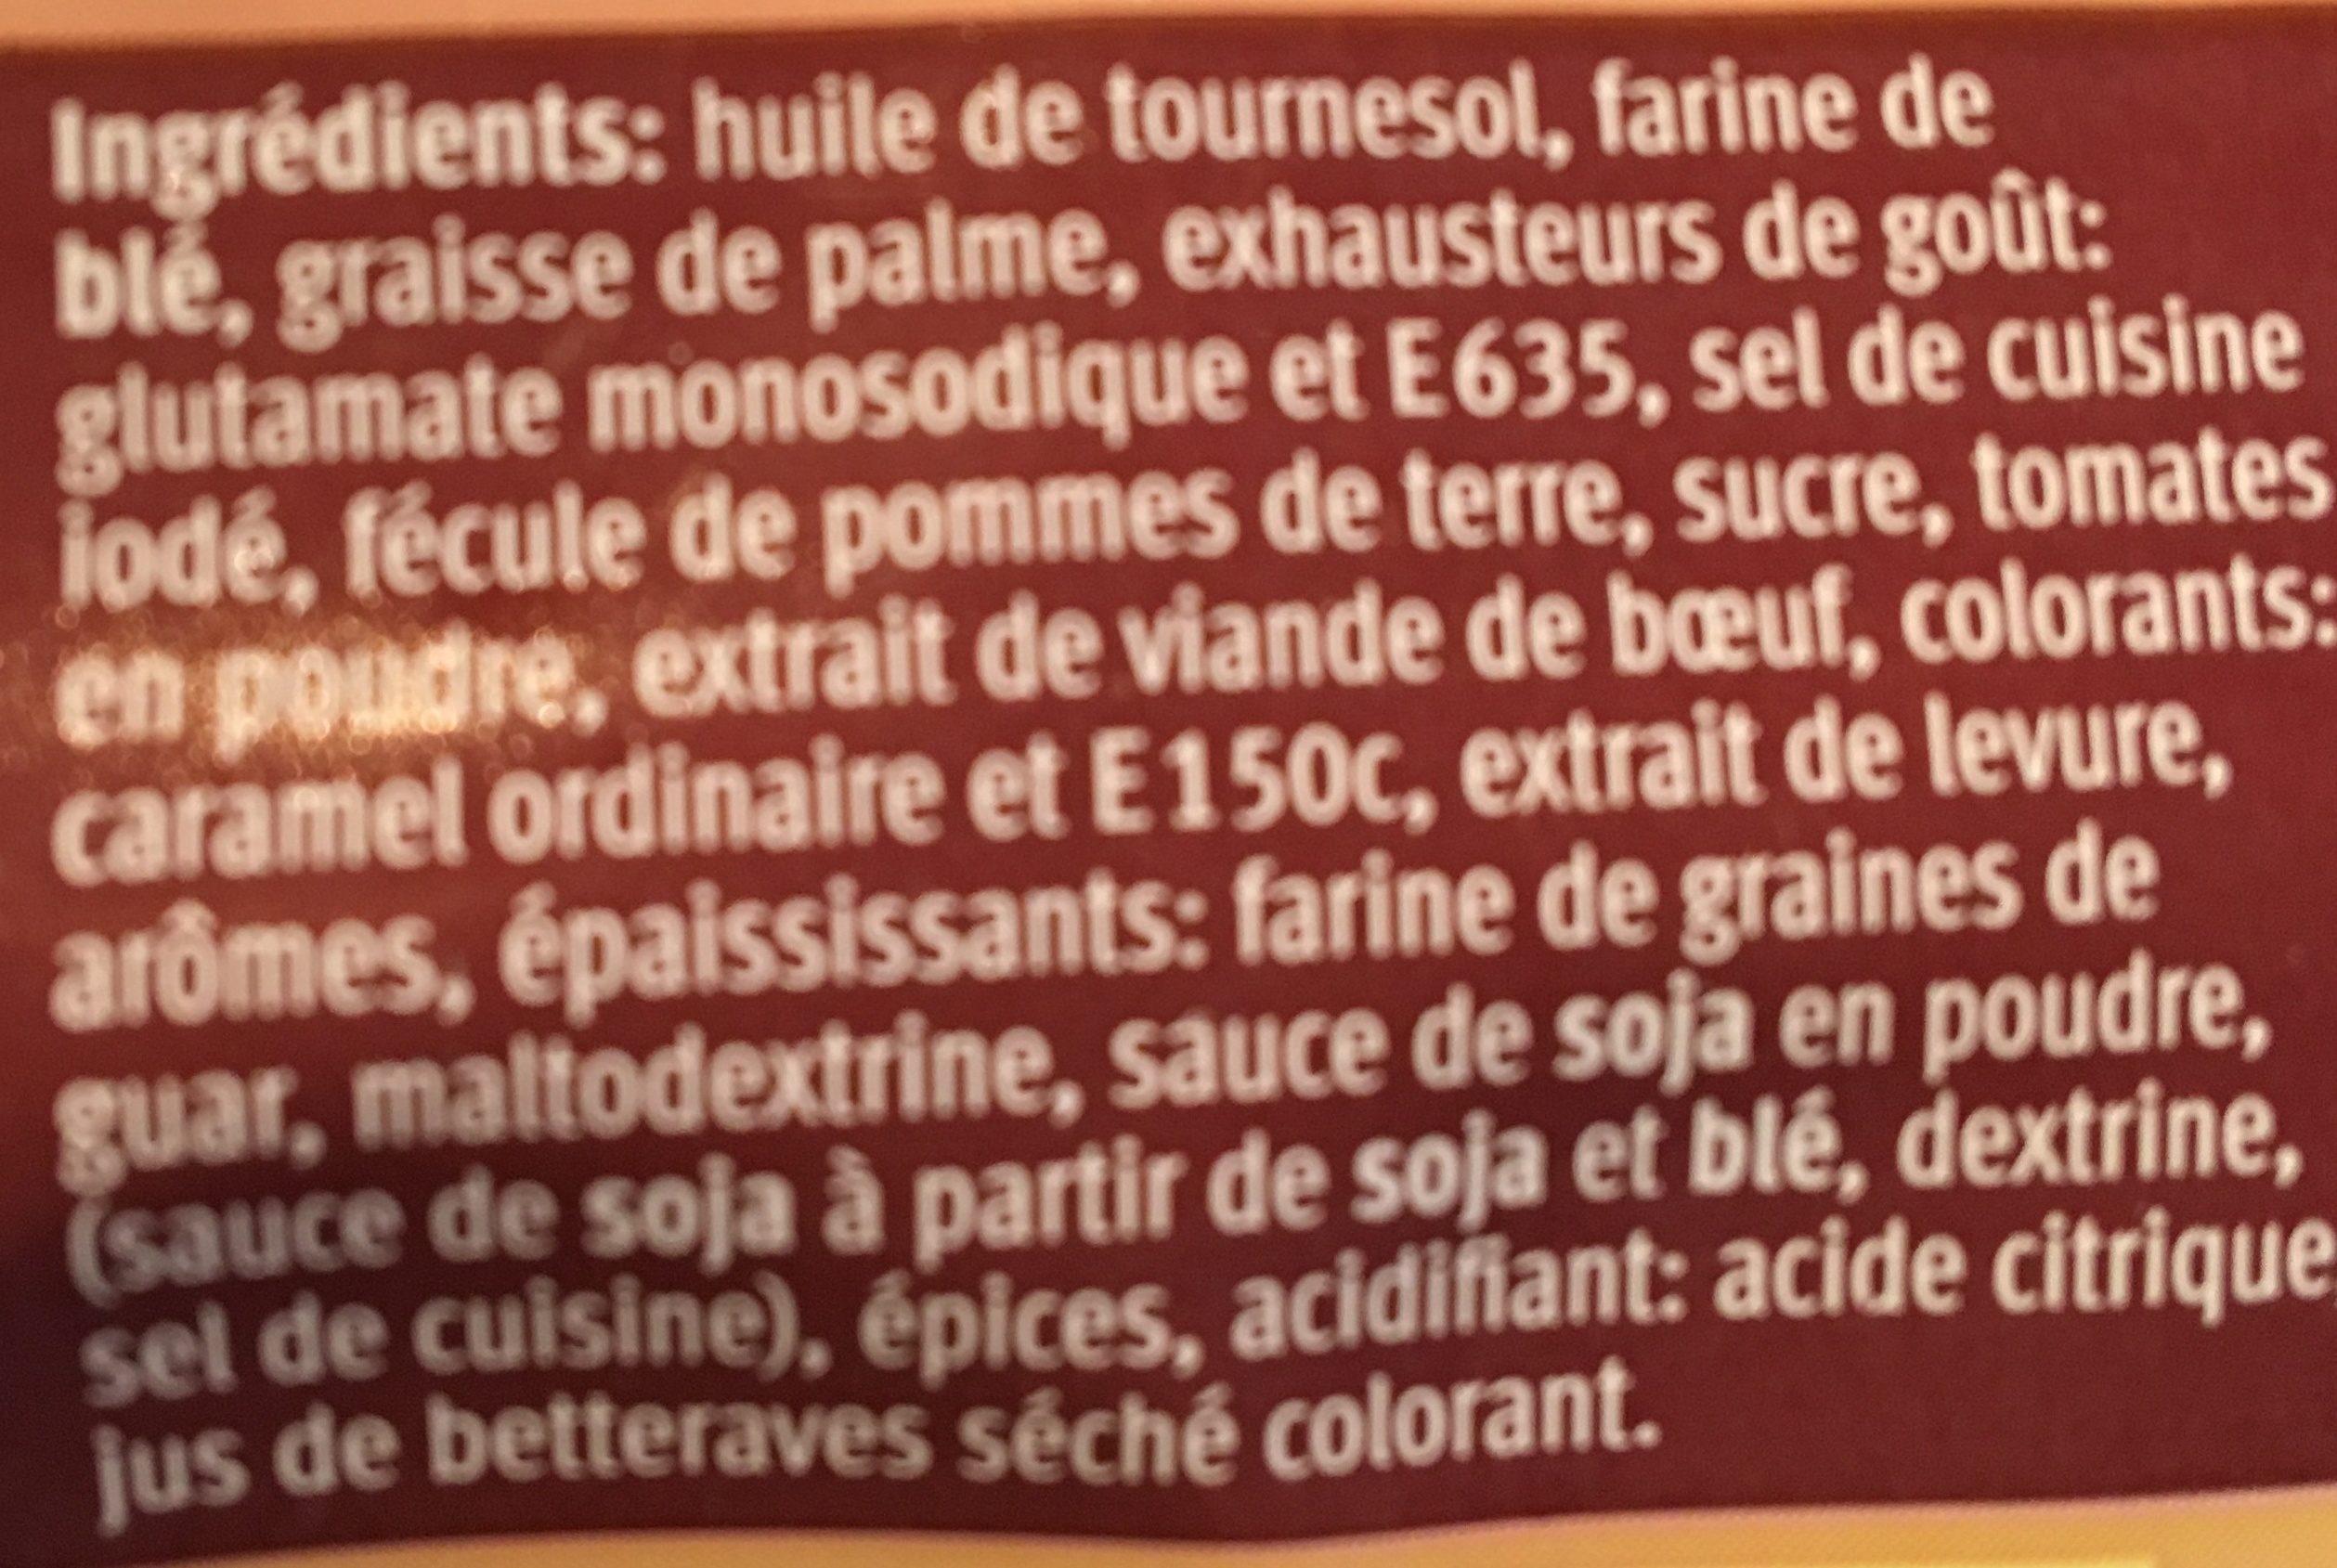 Bratensauce - Sauce pour rôti - Ingredients - fr